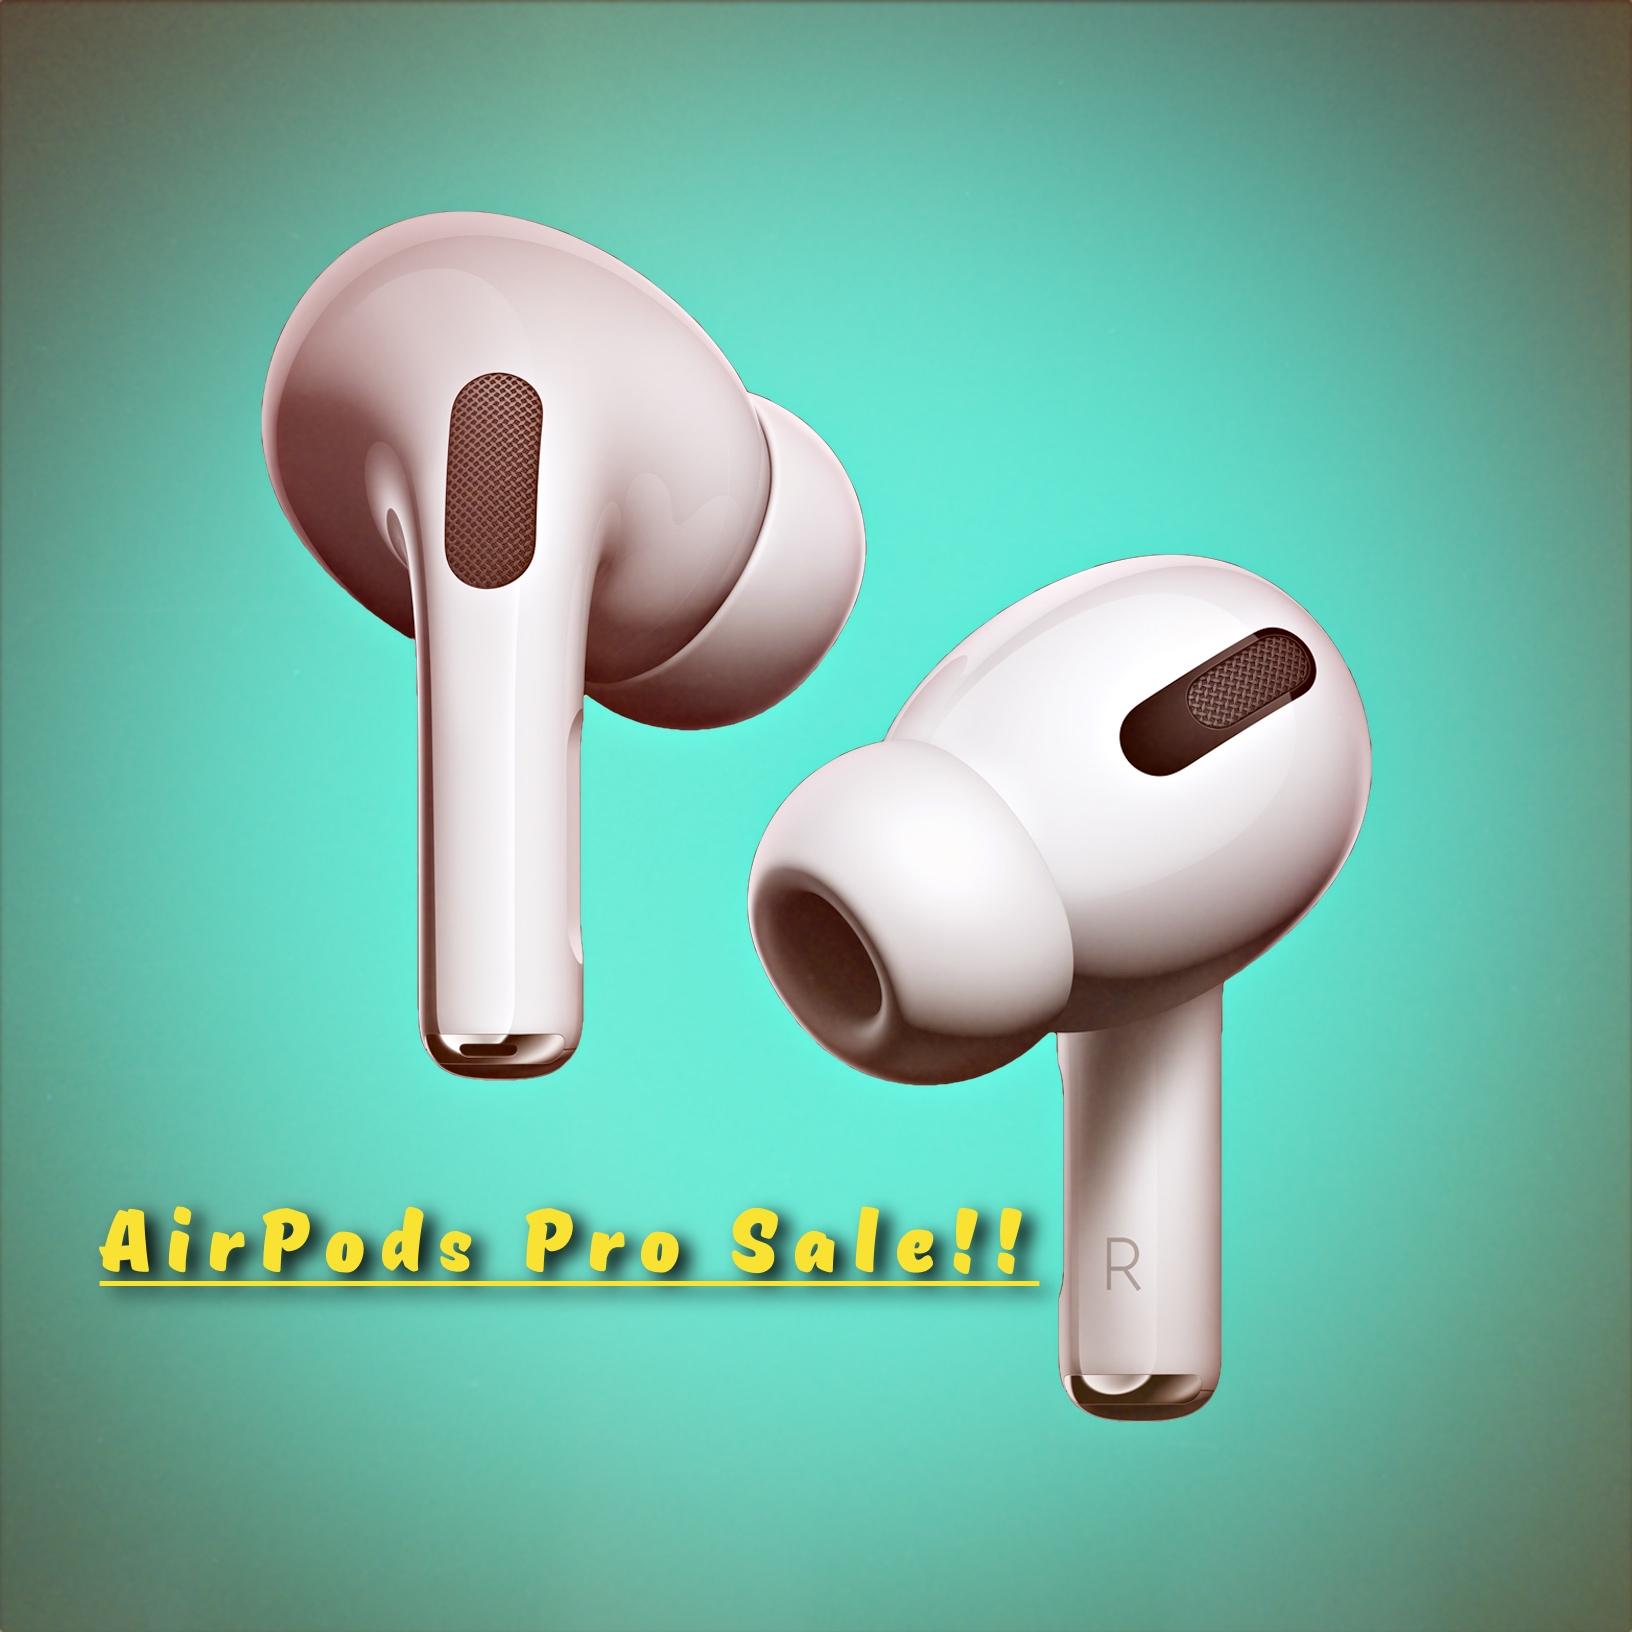 AirPods Pro Deals | Apple AirPods Deals